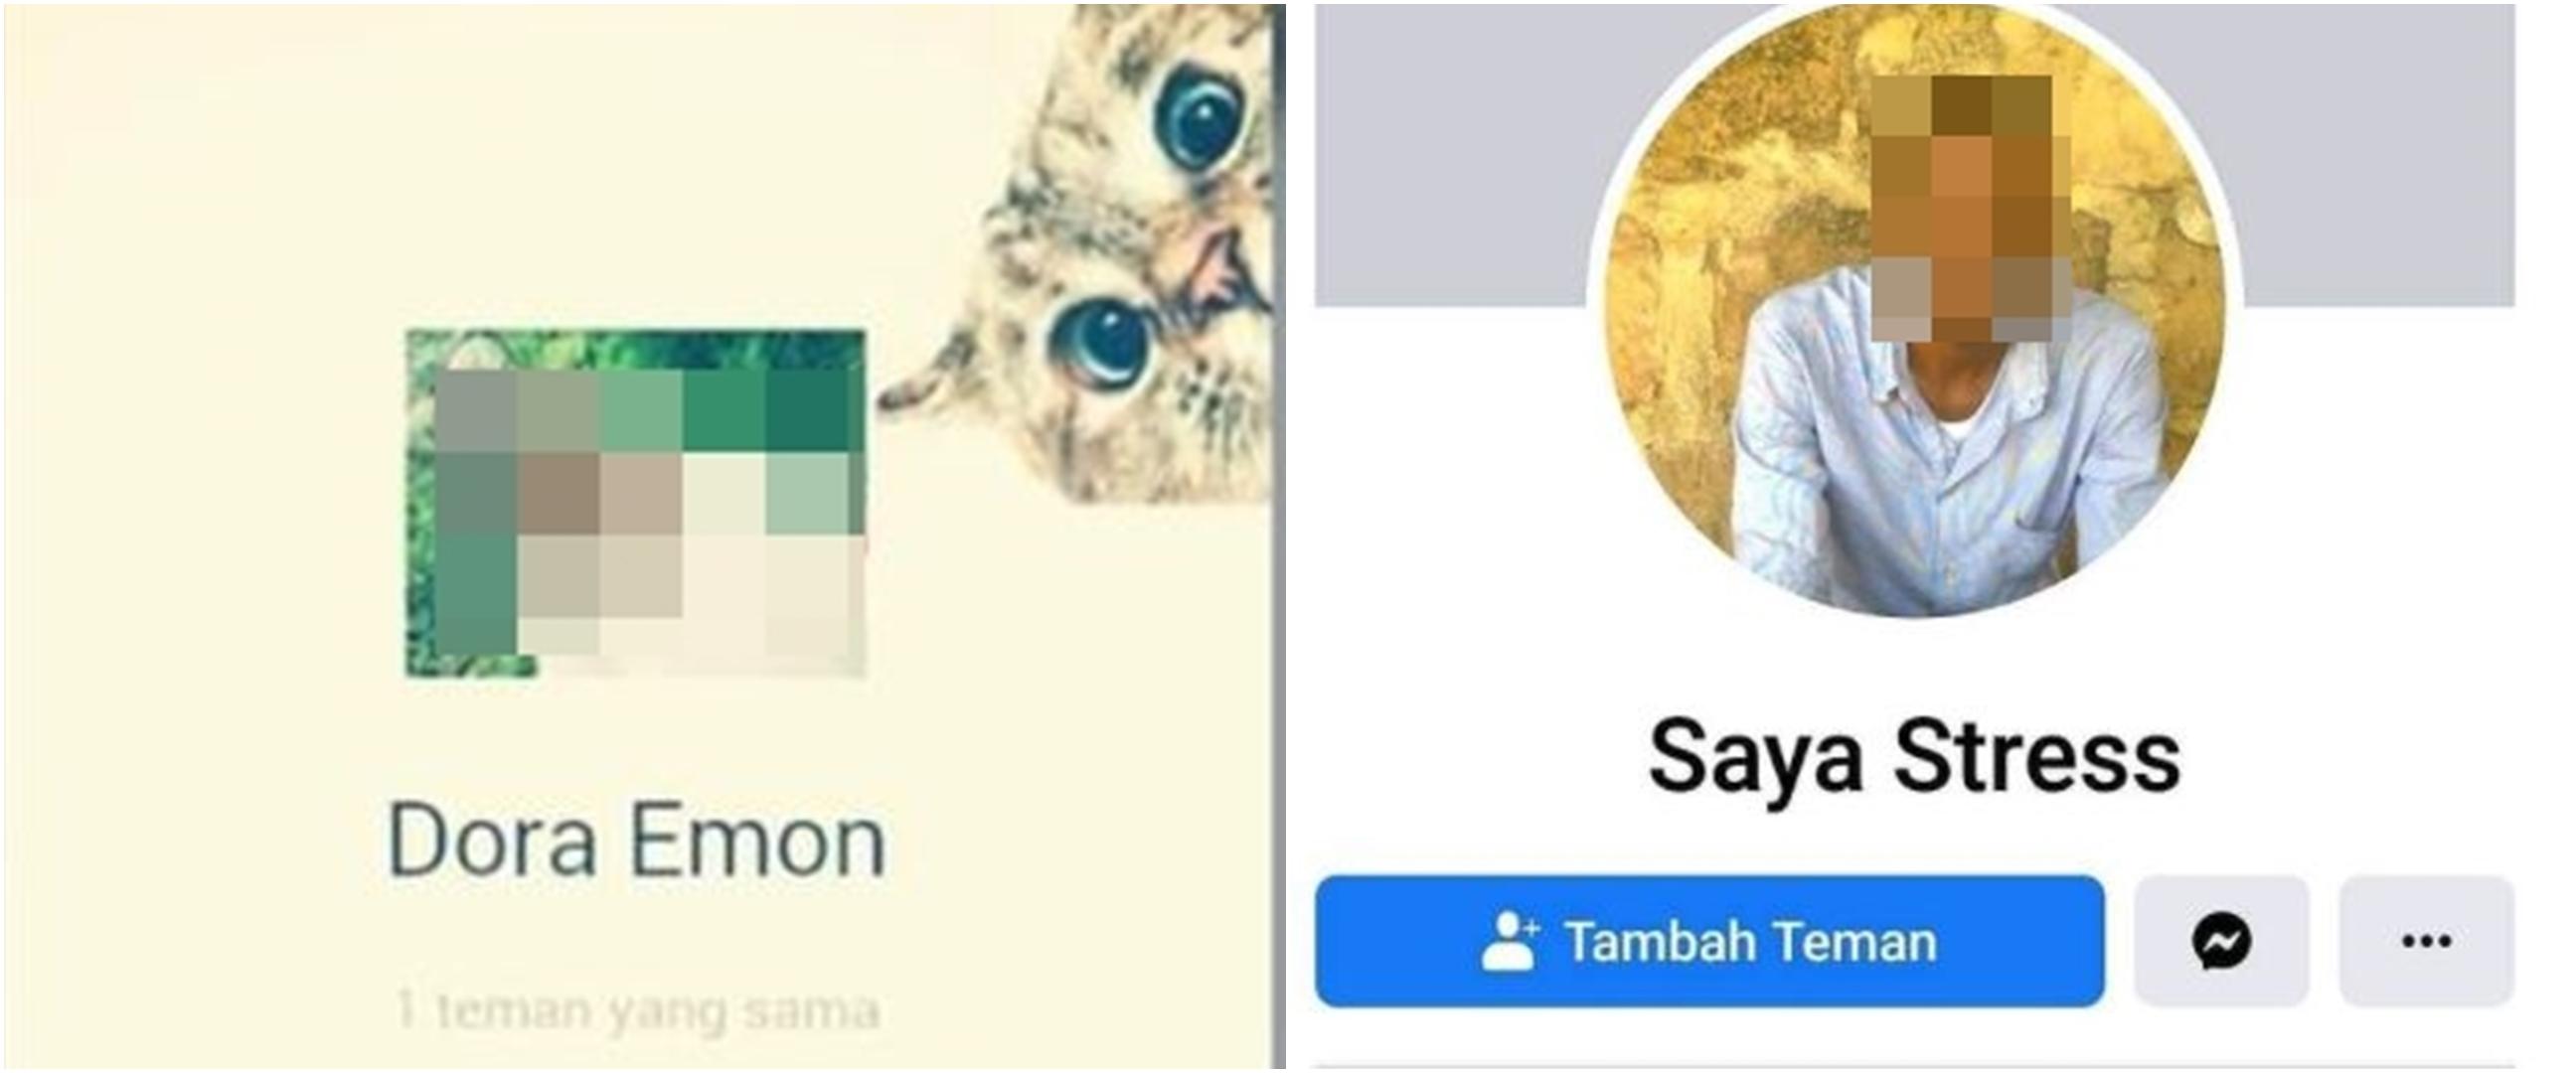 10 Nama akun Facebook absurd ini bikin bingung saat mau berteman